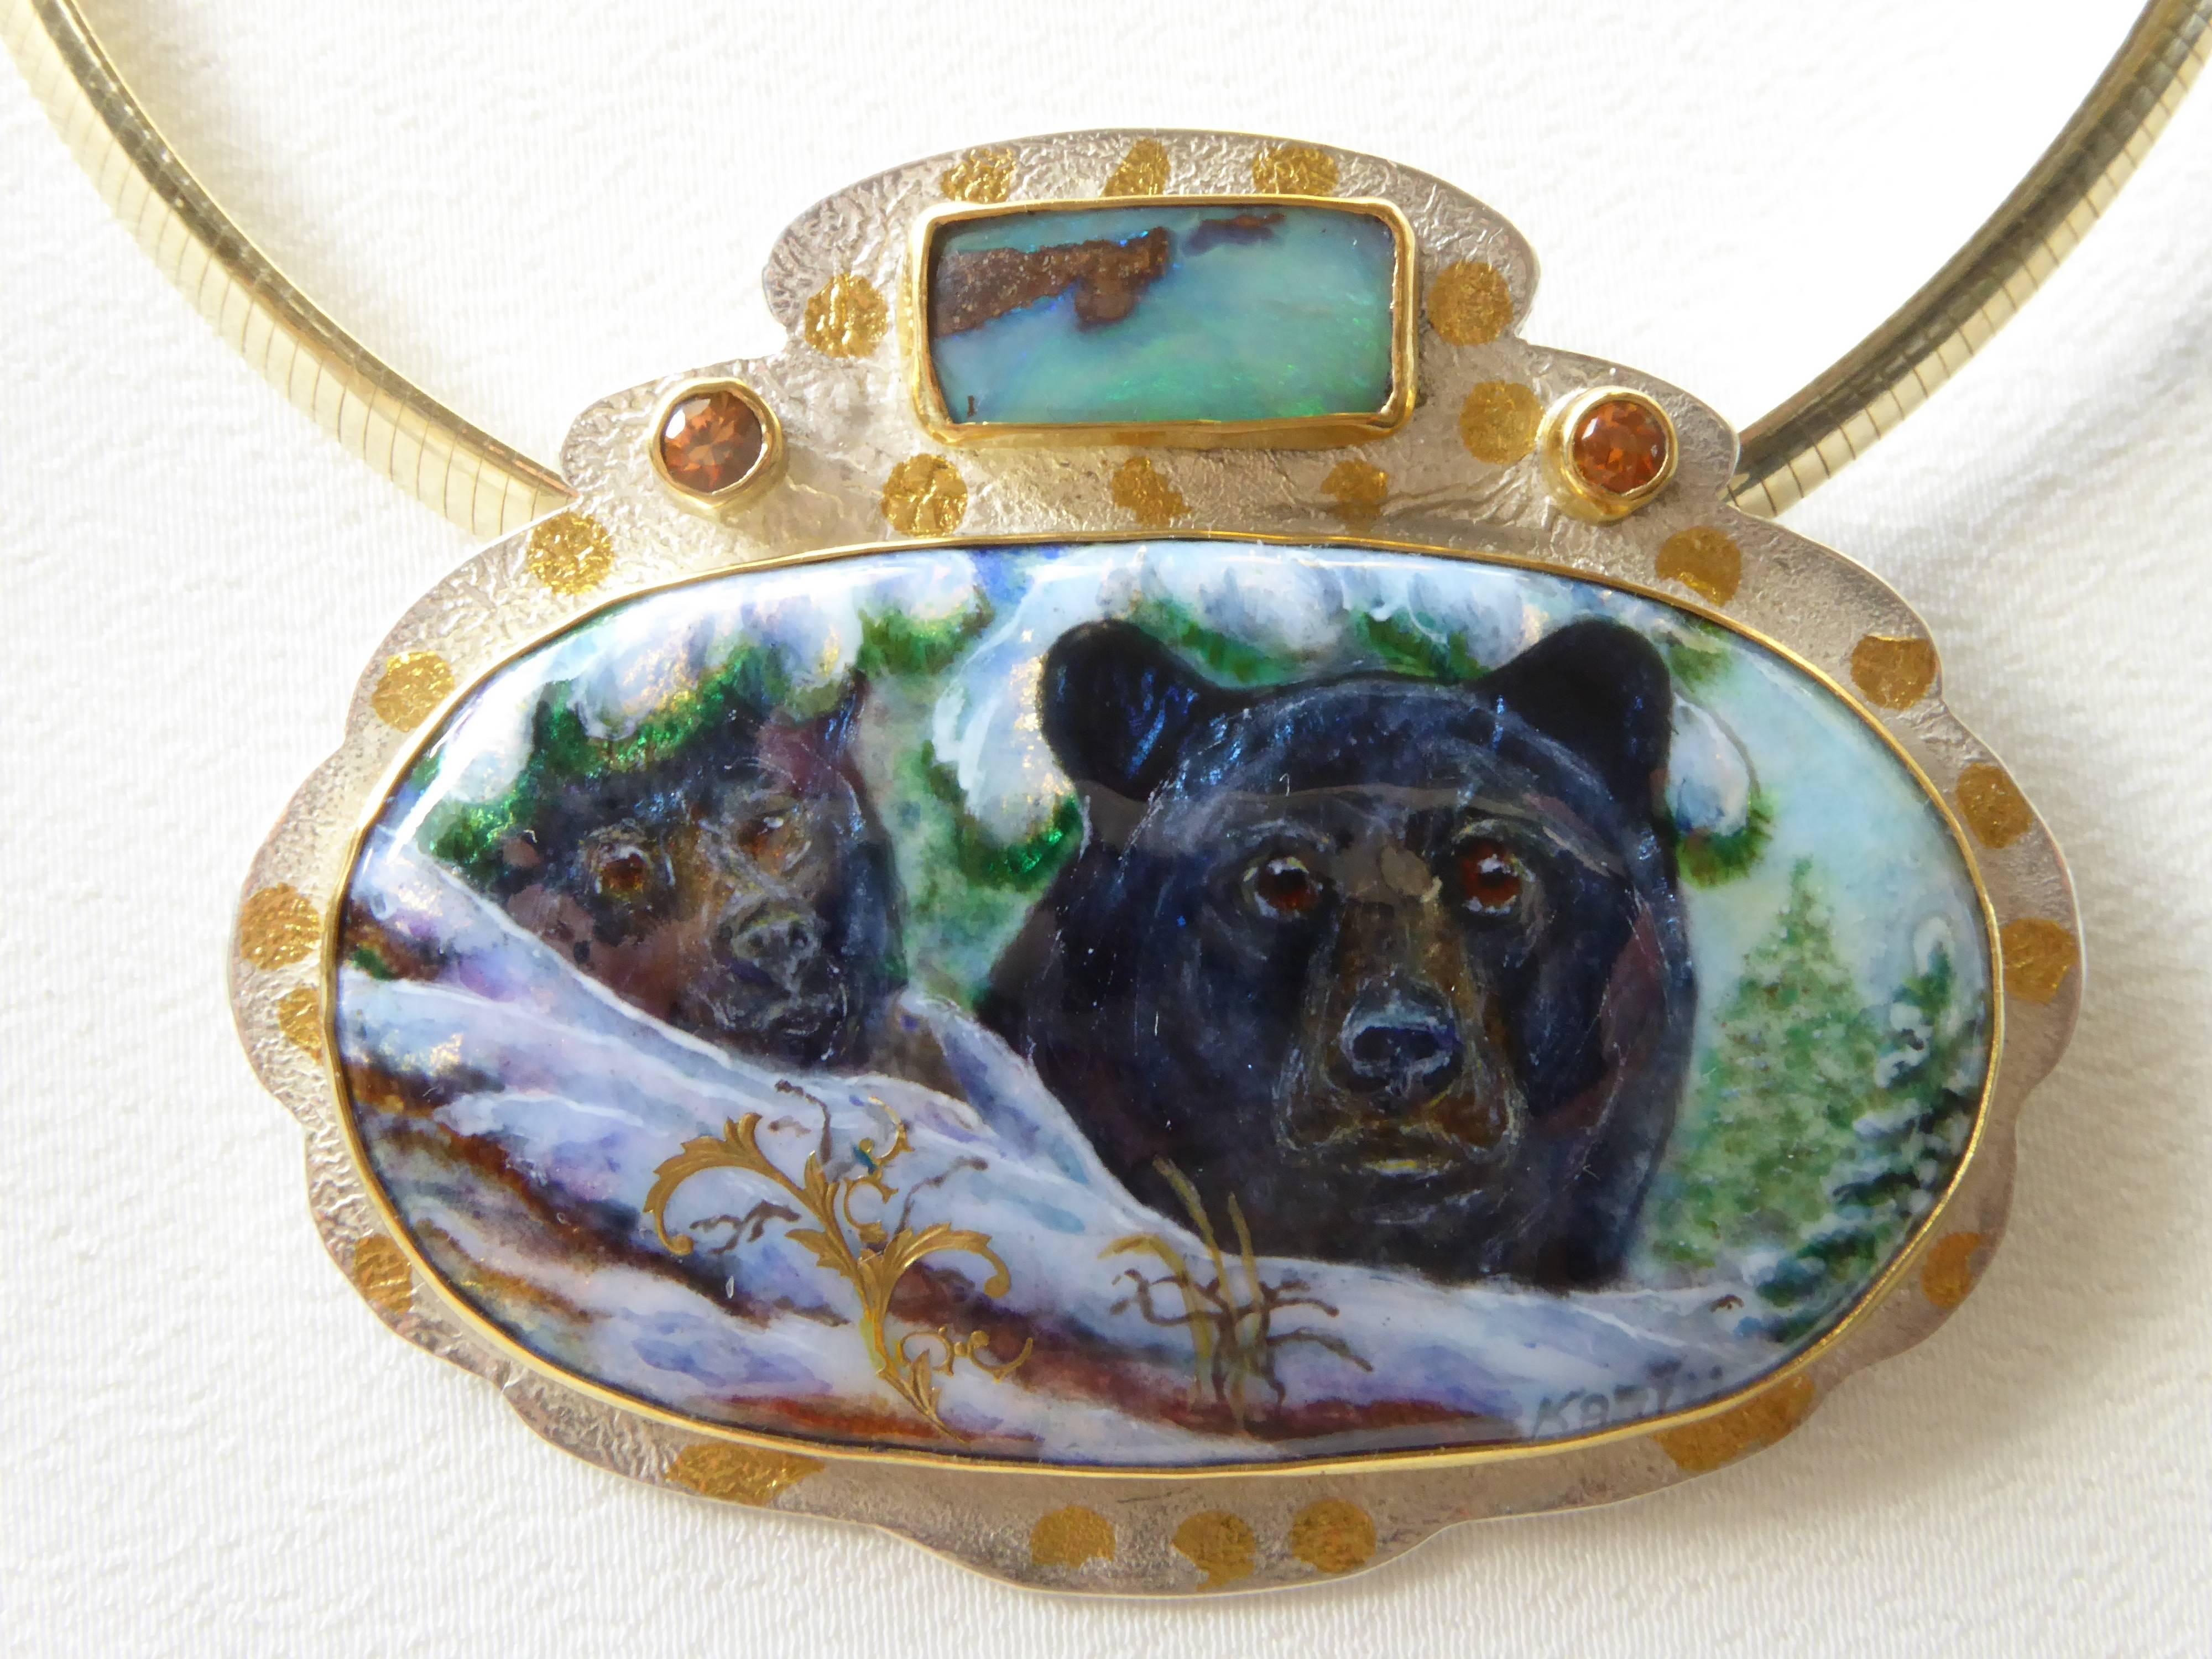 2 Black Bears